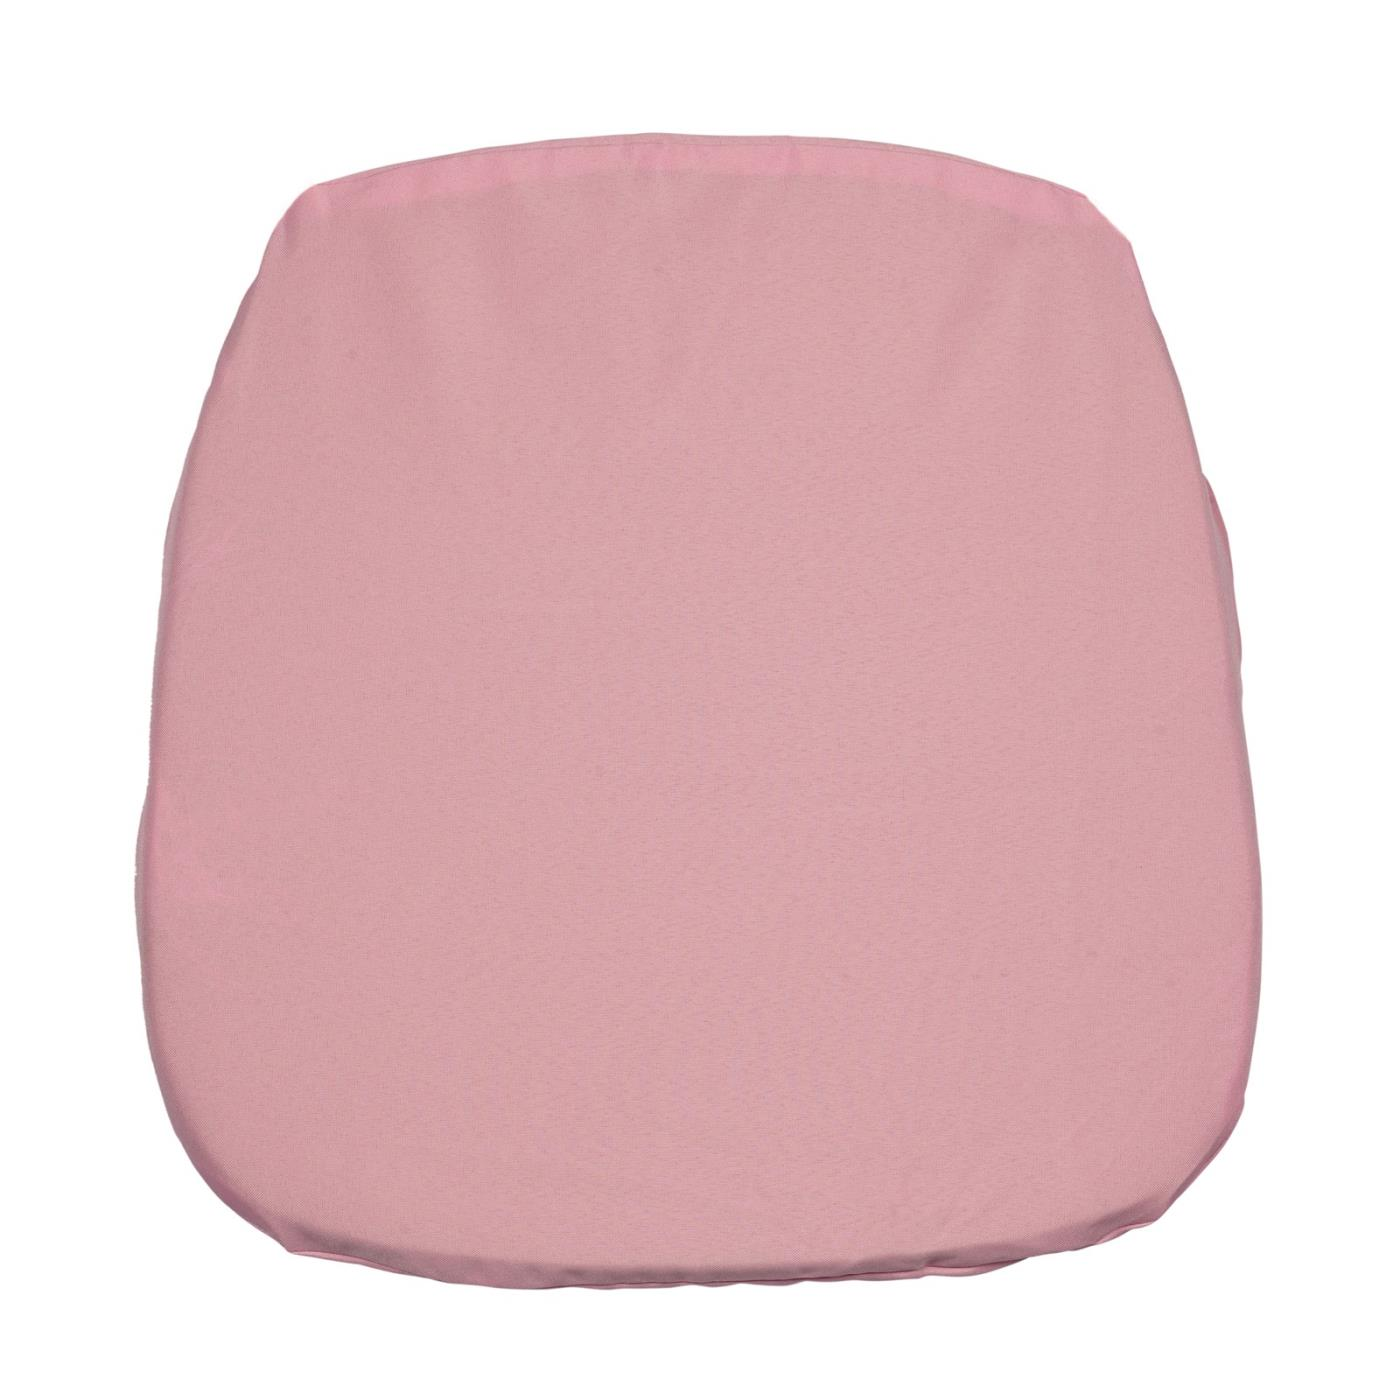 Poly Seat Cushion - Pink Balloon